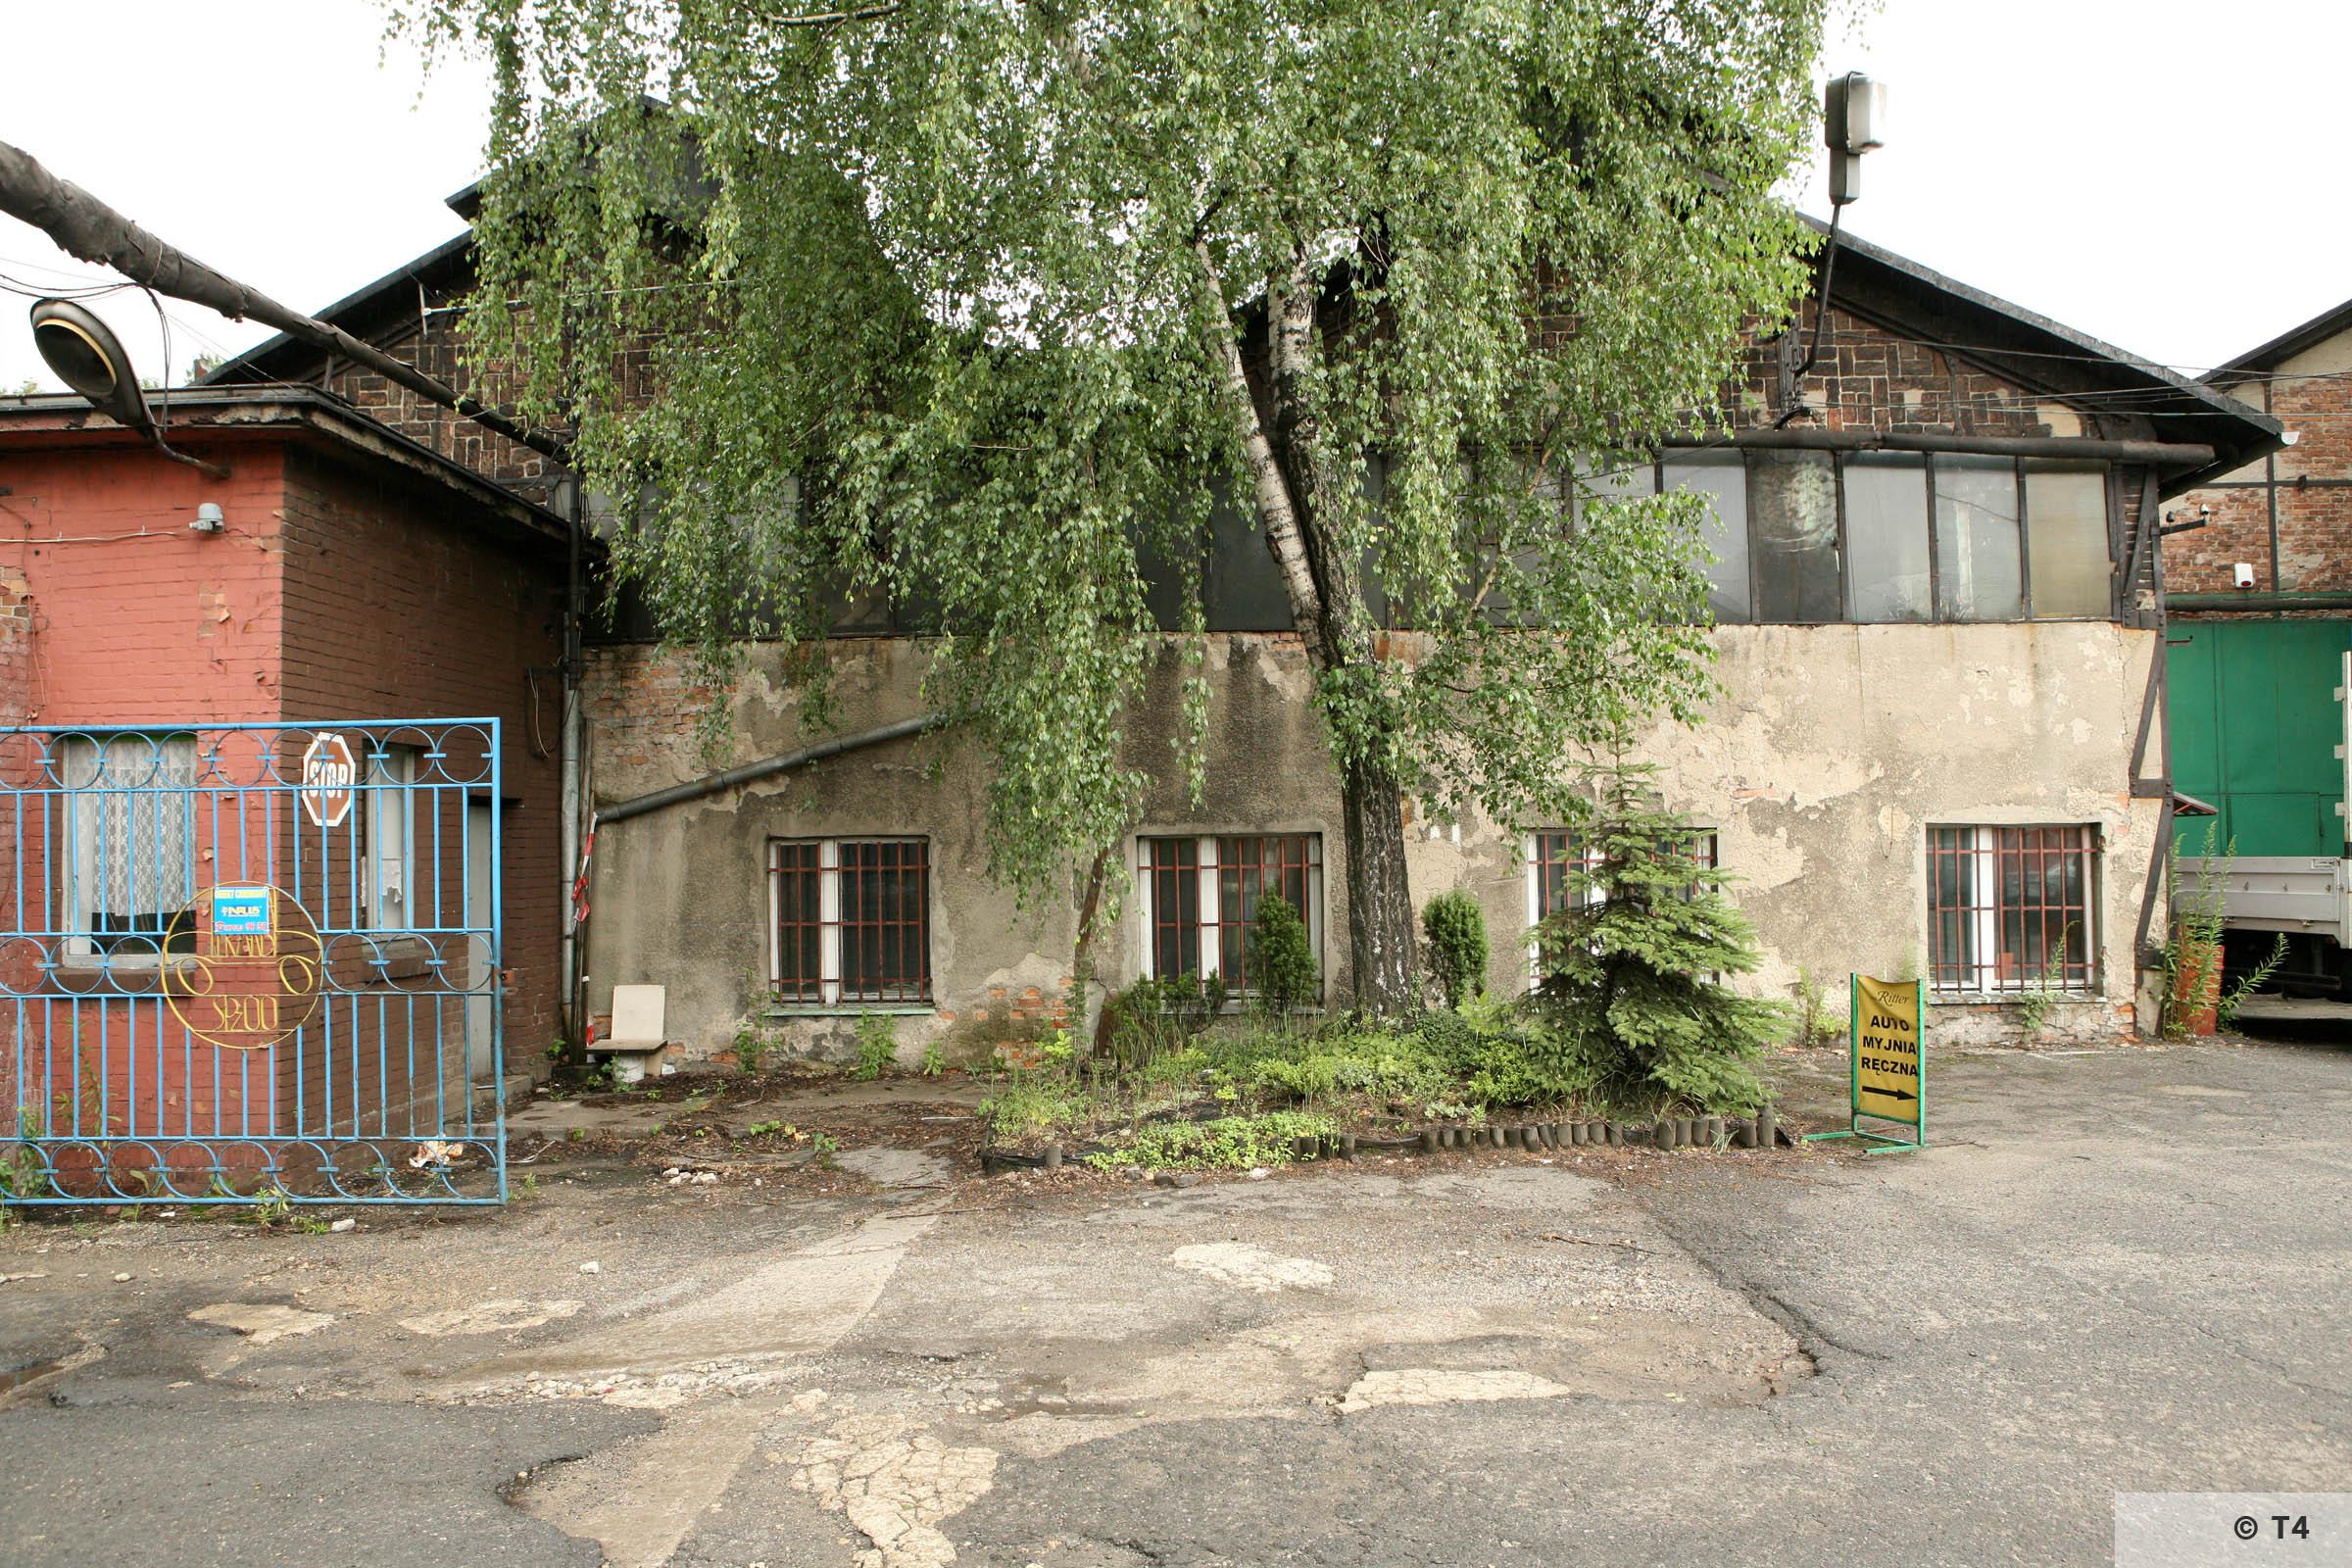 Workshops where prisoners lived. 2007 T4 9515